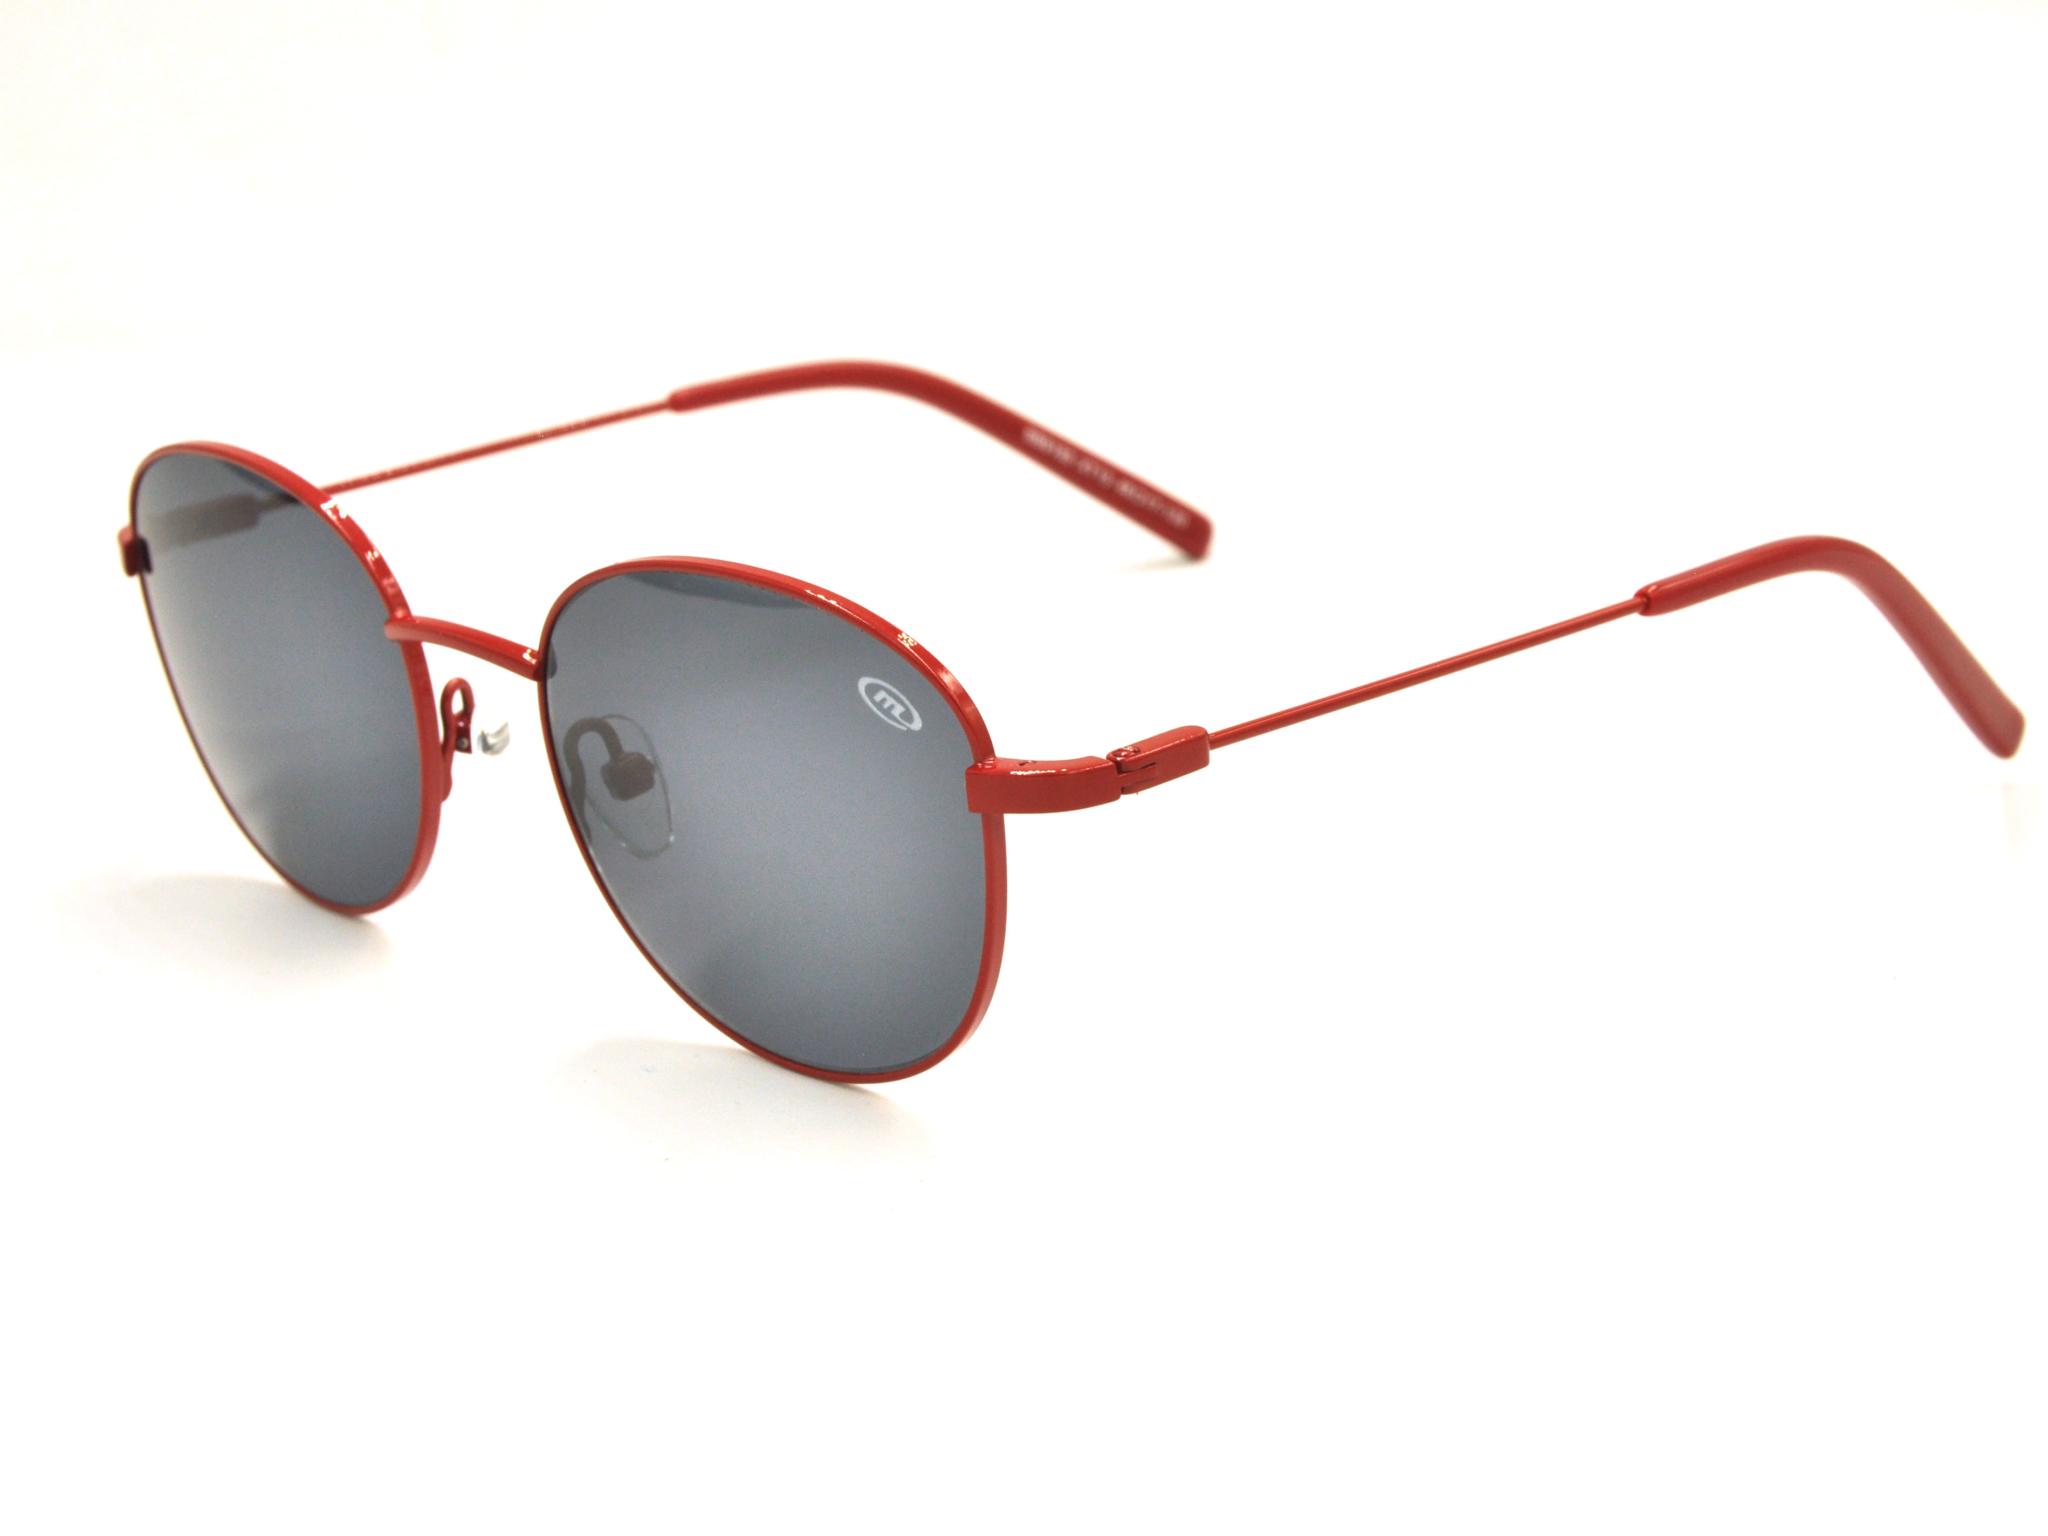 MORITZ JUNIOR BB9183 XT13 Sunglasses 2020